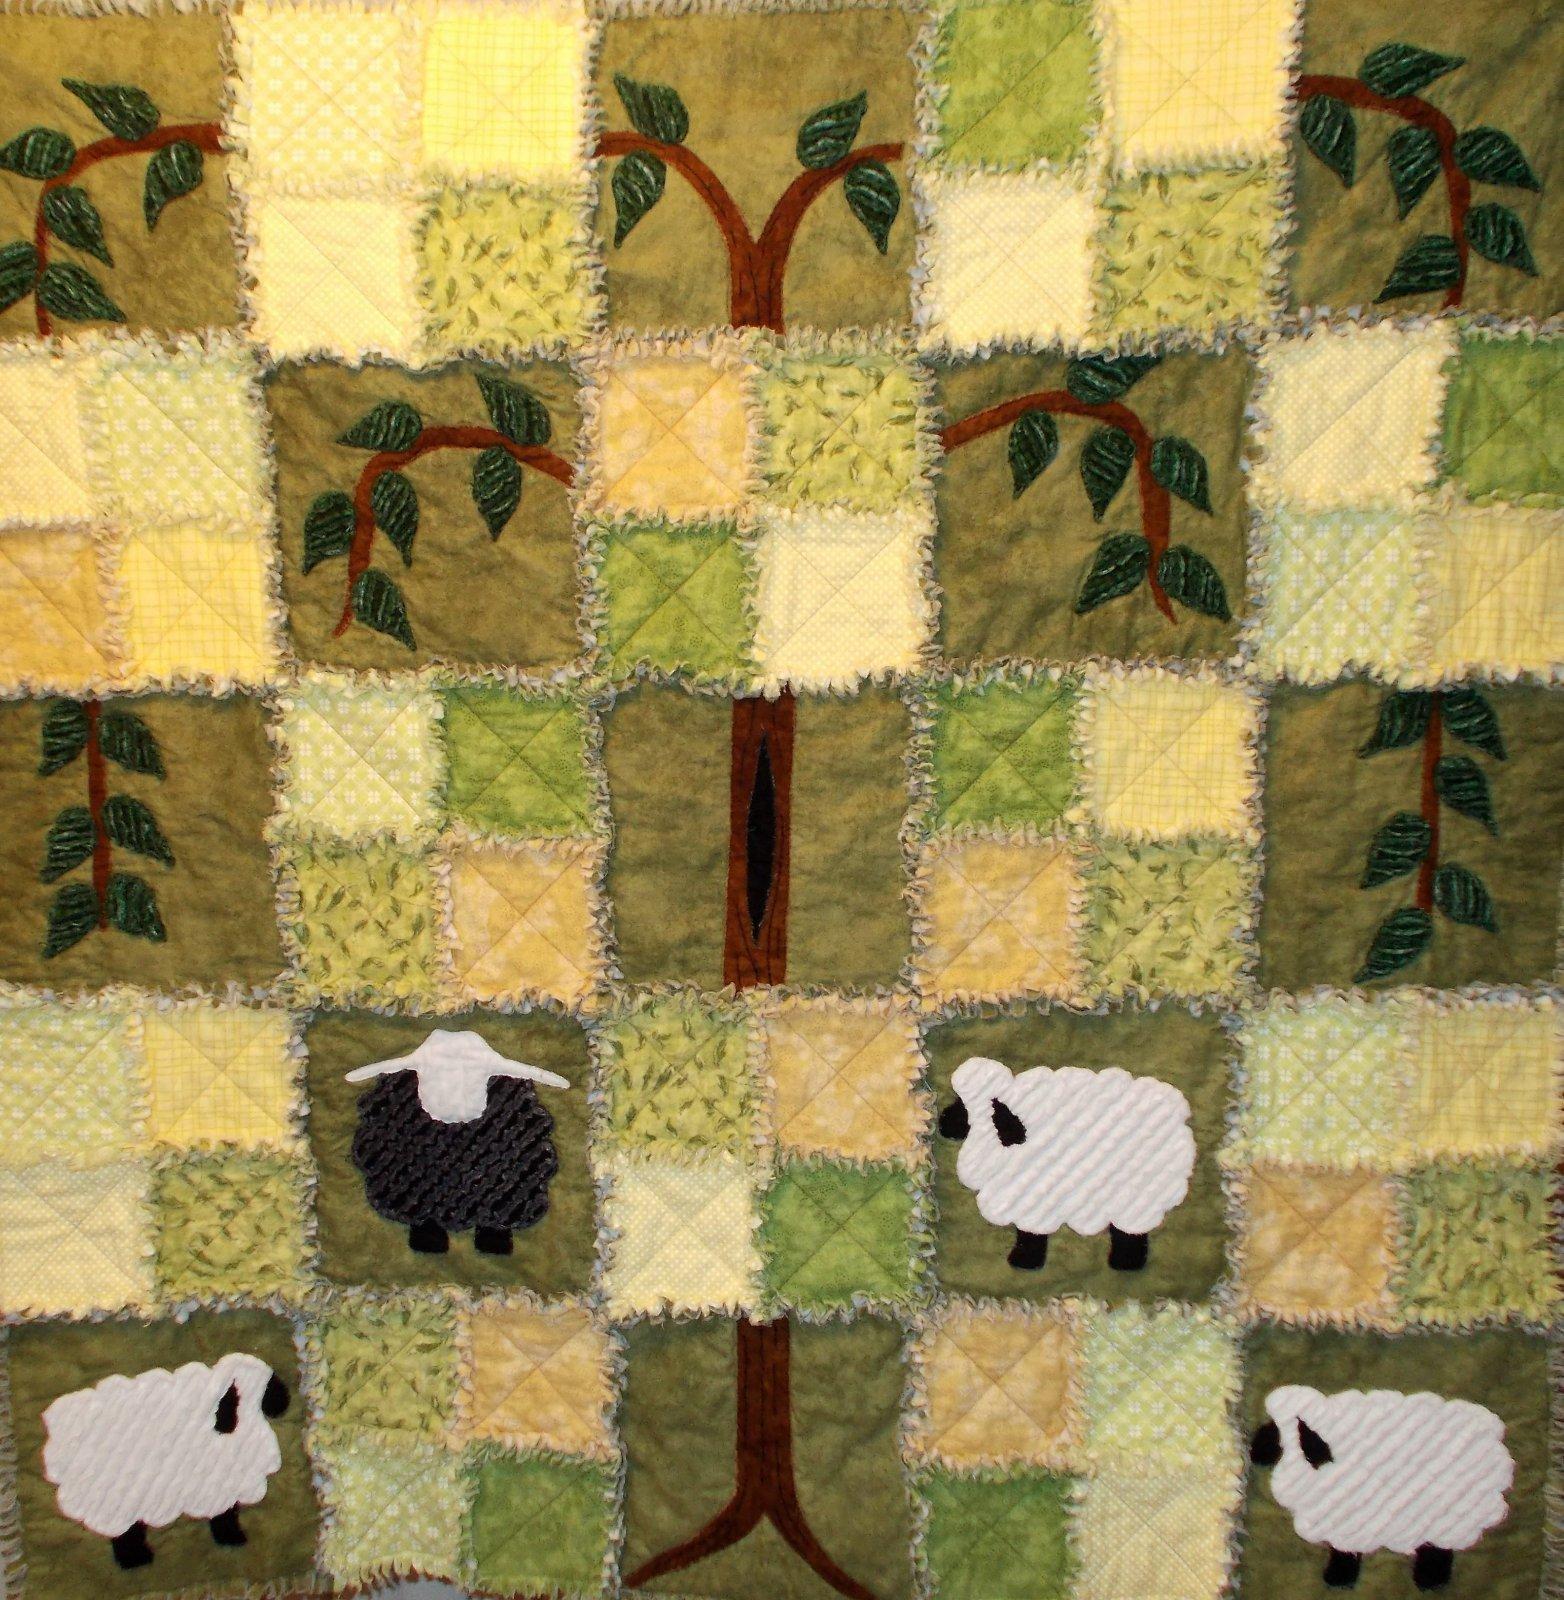 The Black Sheep Pattern